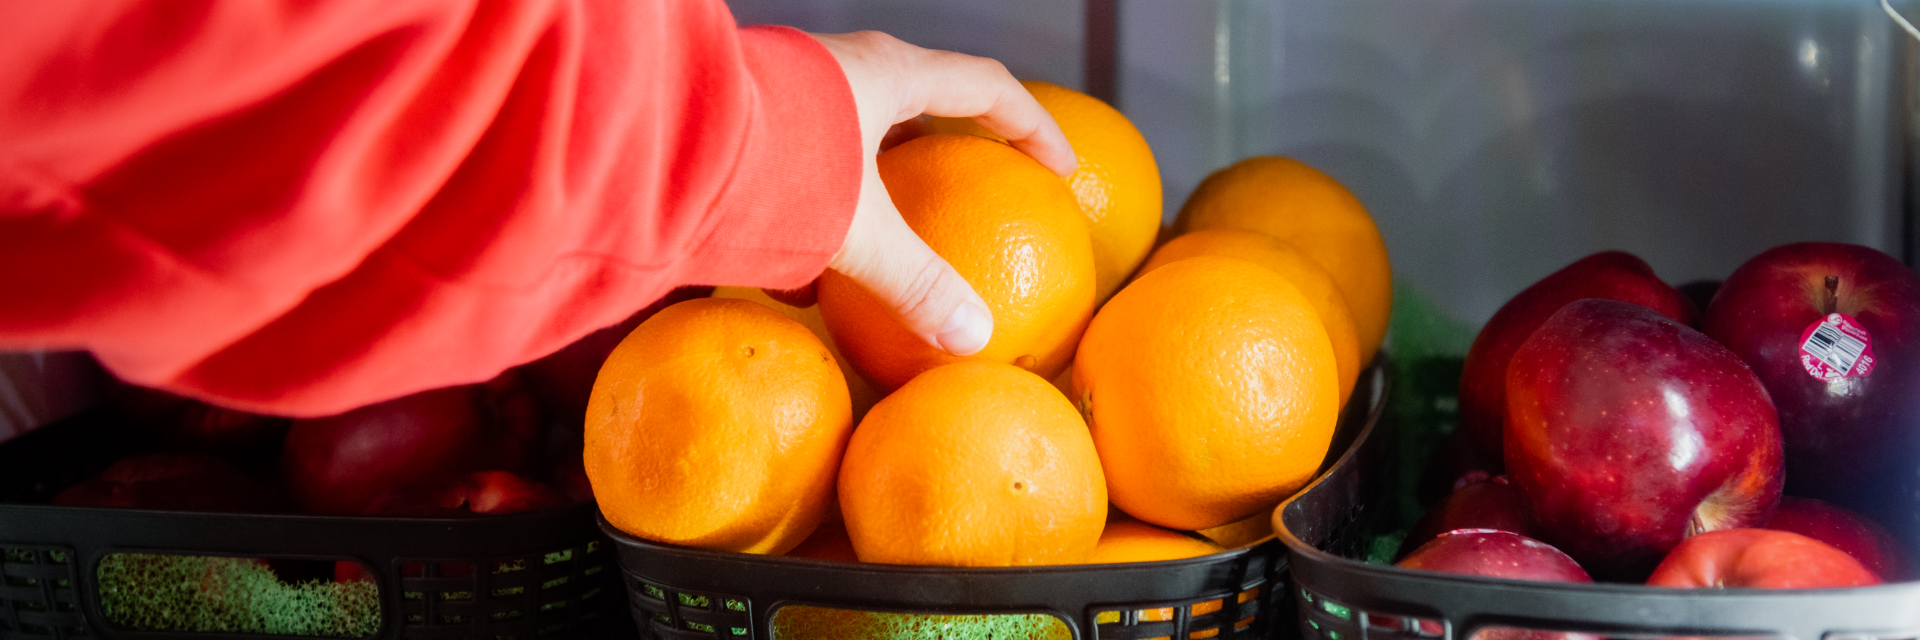 hand grabbing an orange